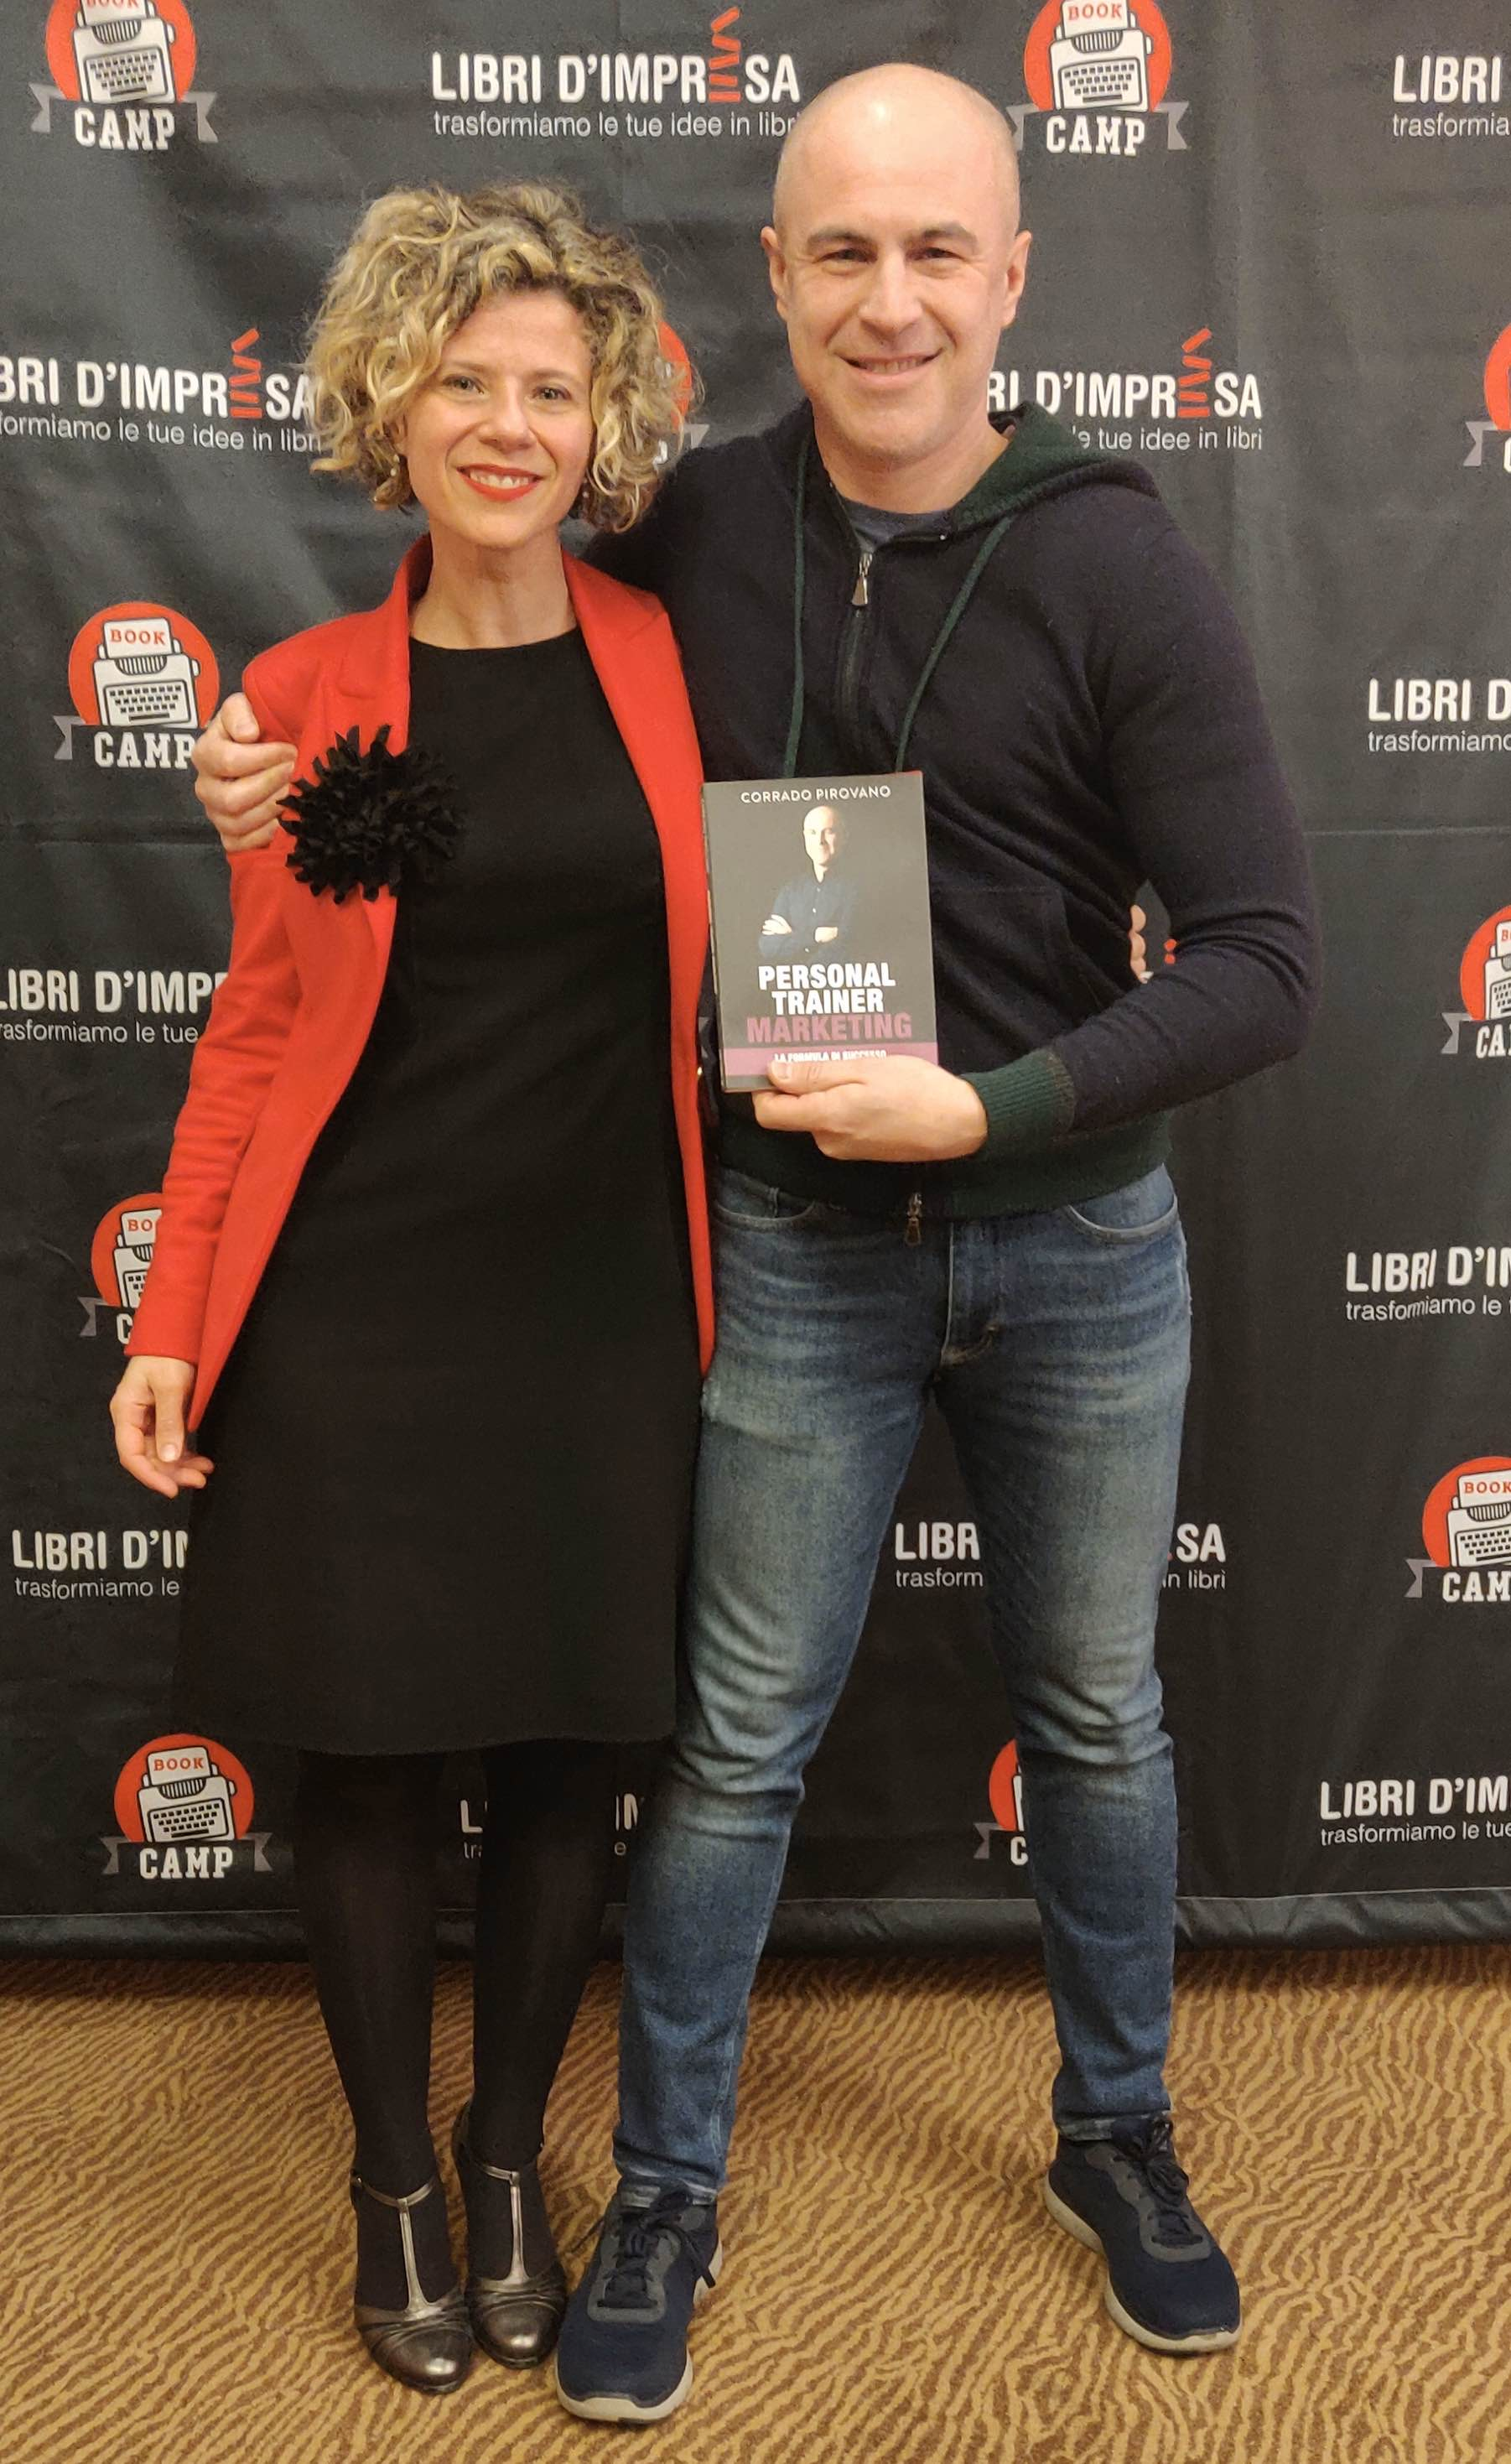 BookCamp gennaio 2020 - Libri d'Impresa - Denise Cumella